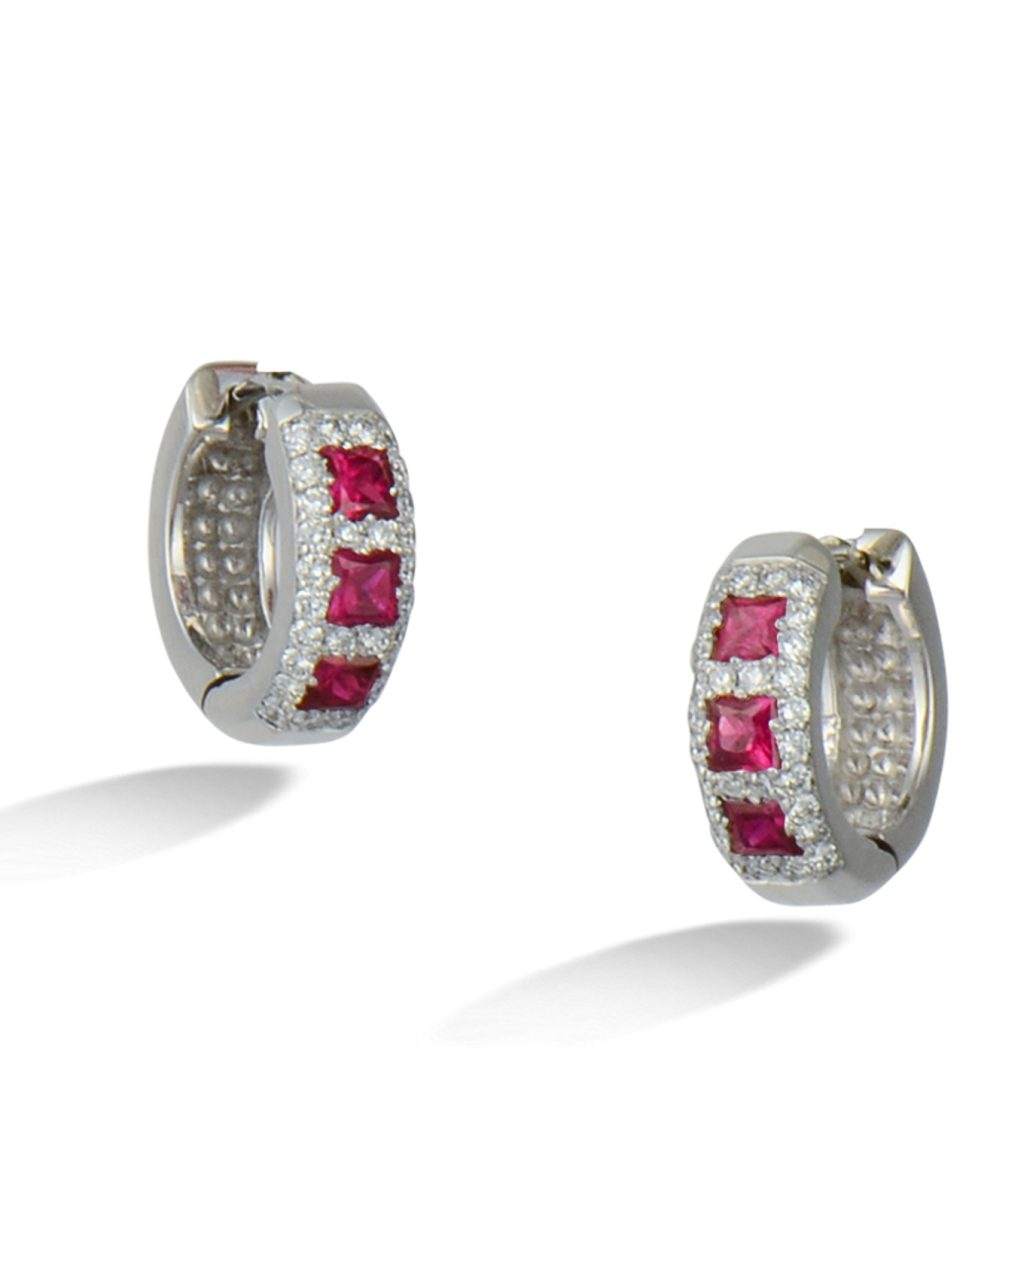 Ruby and diamond hoops